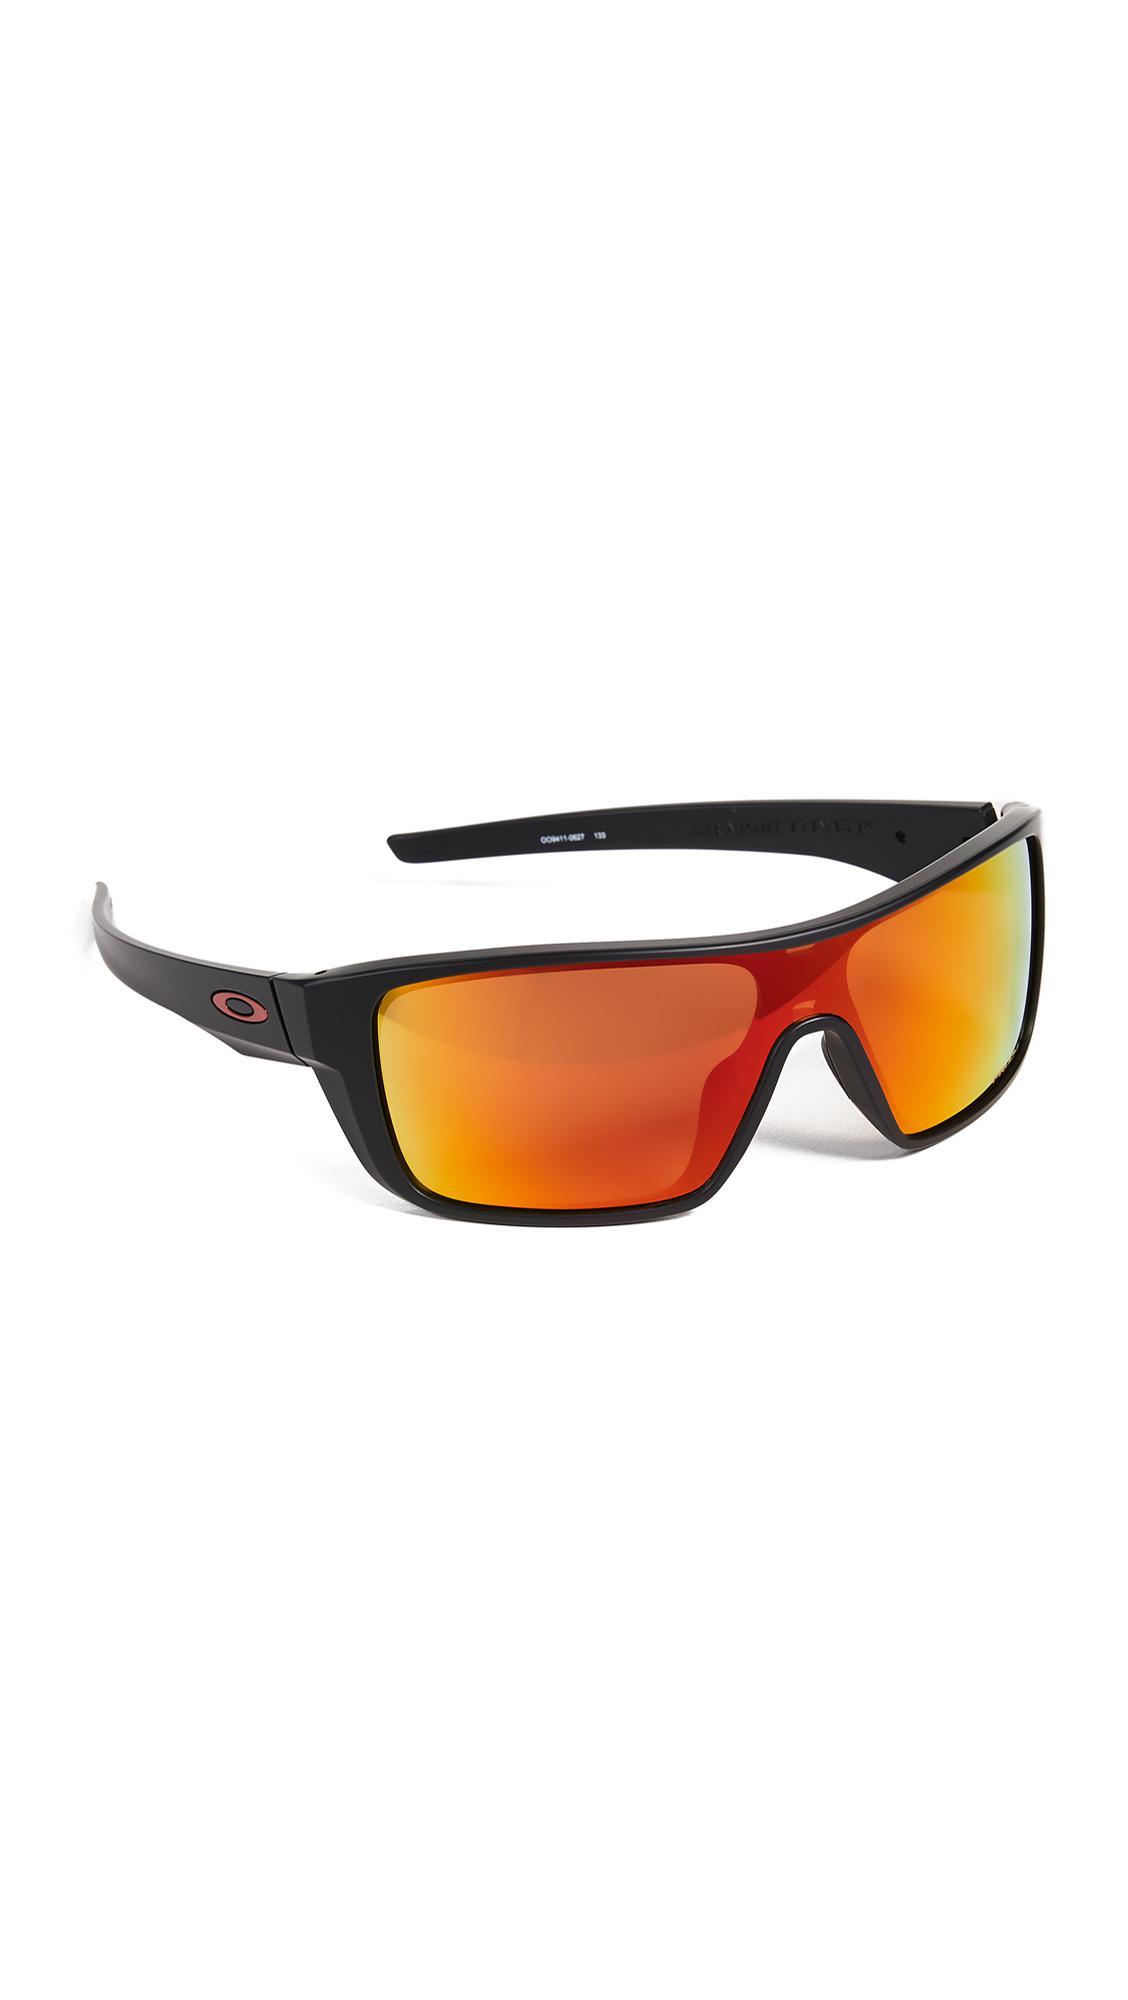 34d1194f92a6c Oakley Straightback Polarized Sunglasses for Men - Lyst